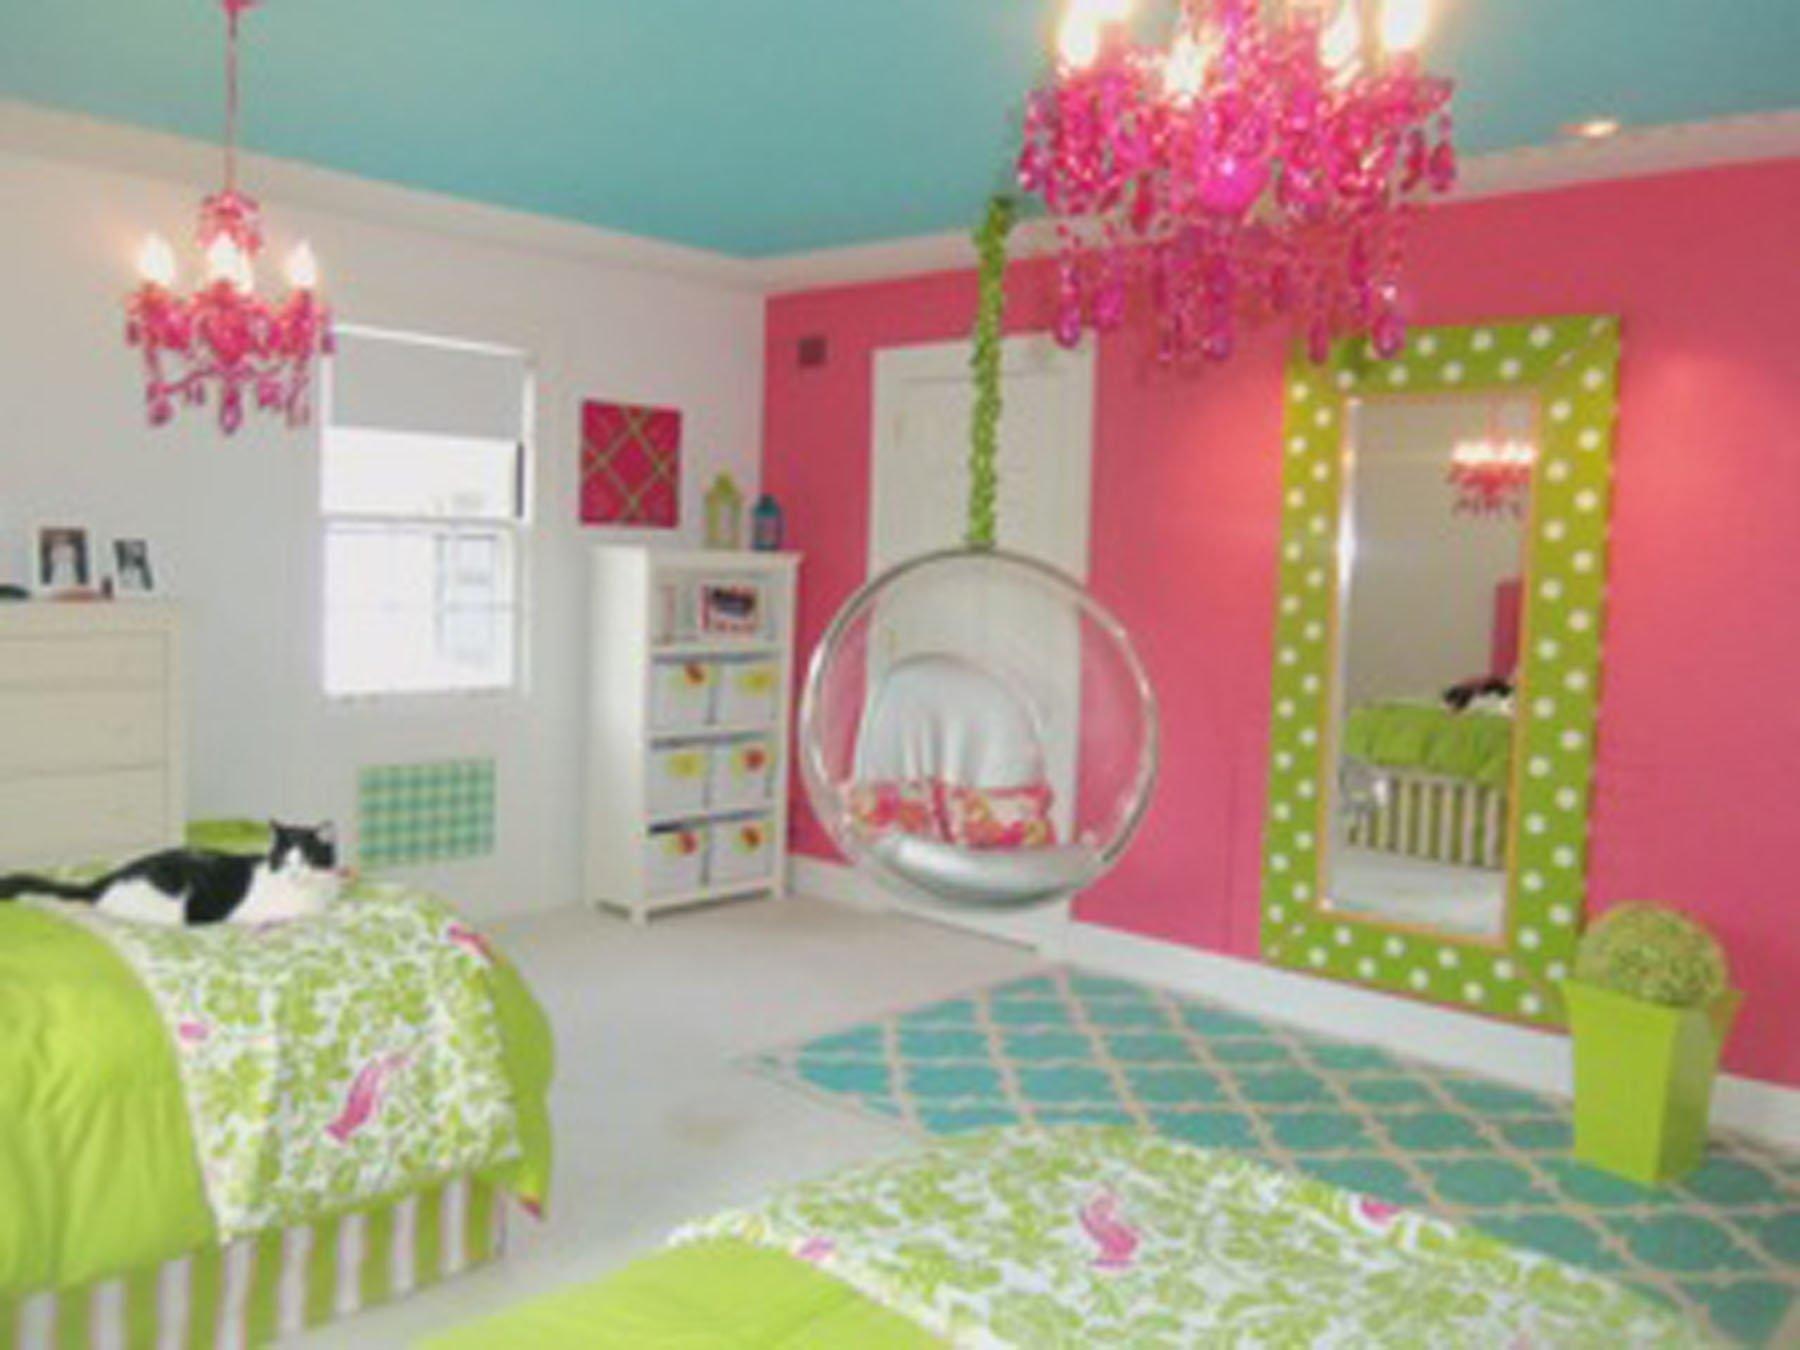 10 Stylish Teenage Girl Room Decorating Ideas teenage girl room decor ideas for your and bedroom trends savwi 2020